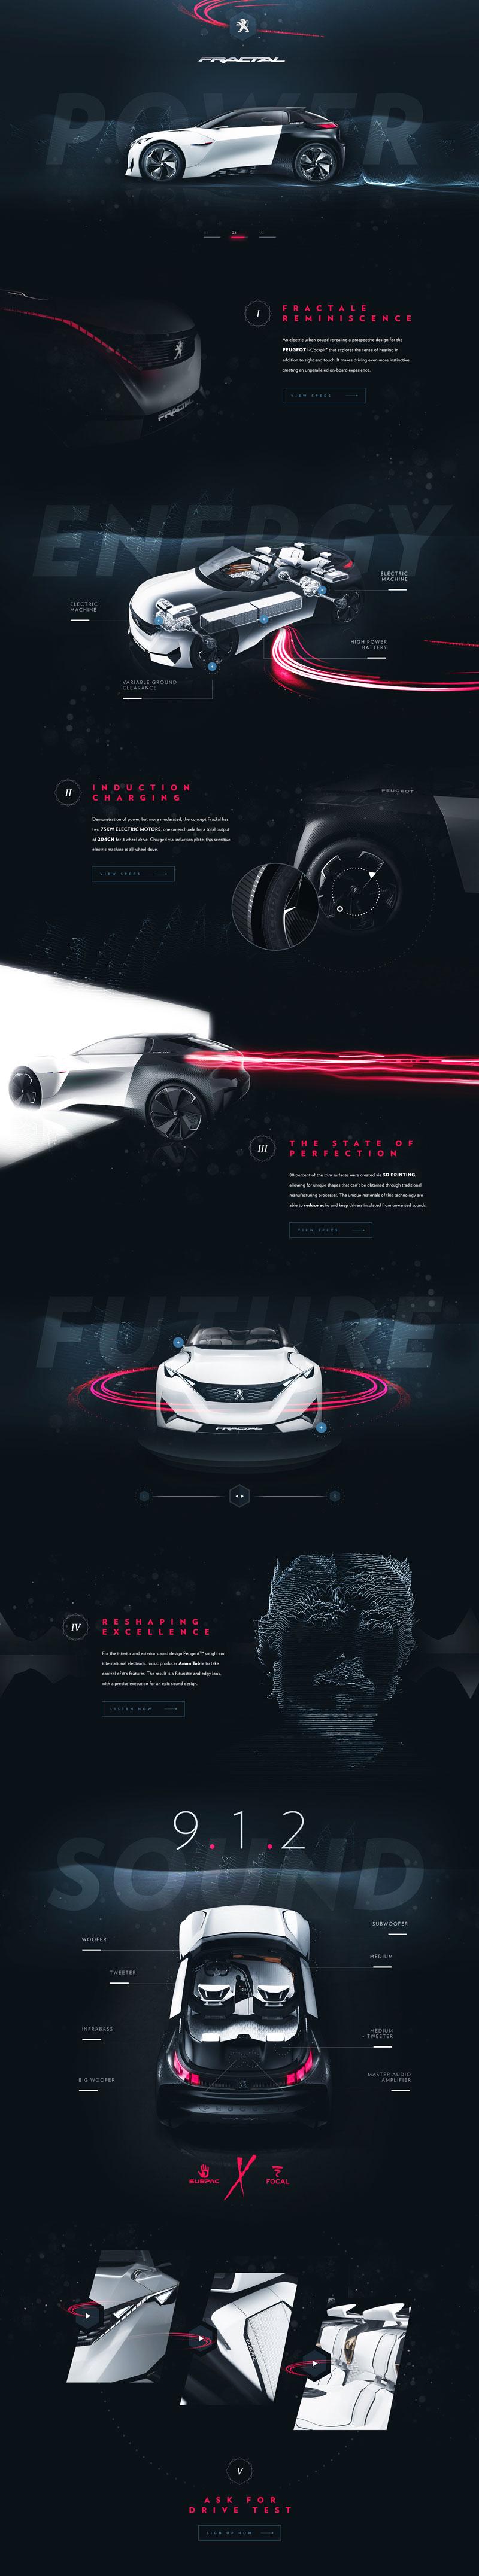 Peugeot Fractale Product Web Inspiration